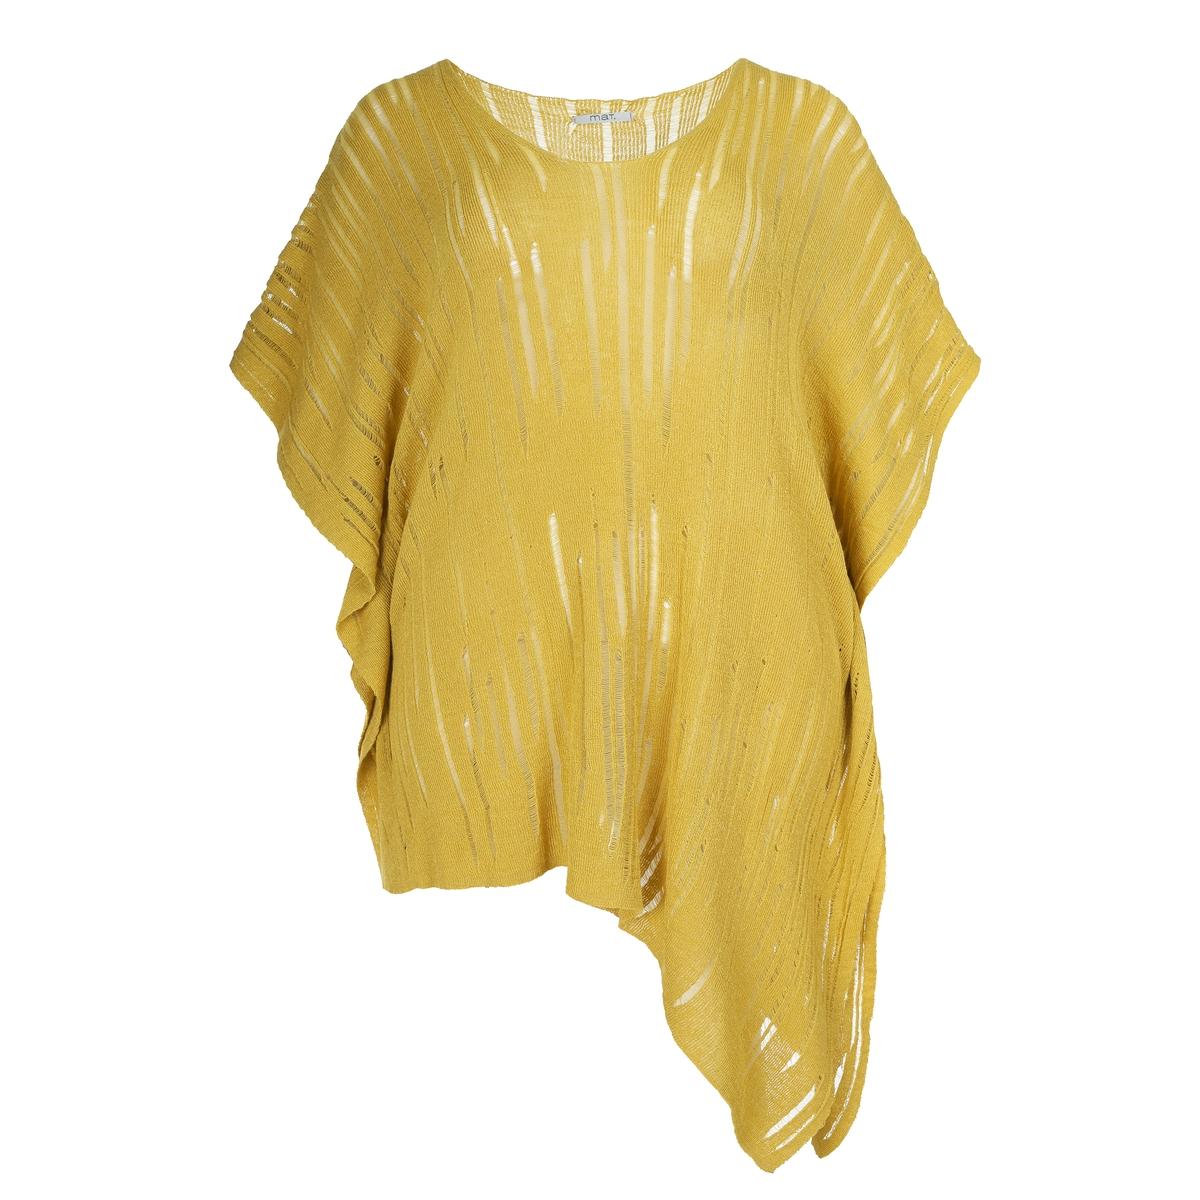 Пуловер асимметричный<br><br>Цвет: горчичный<br>Размер: 44/48